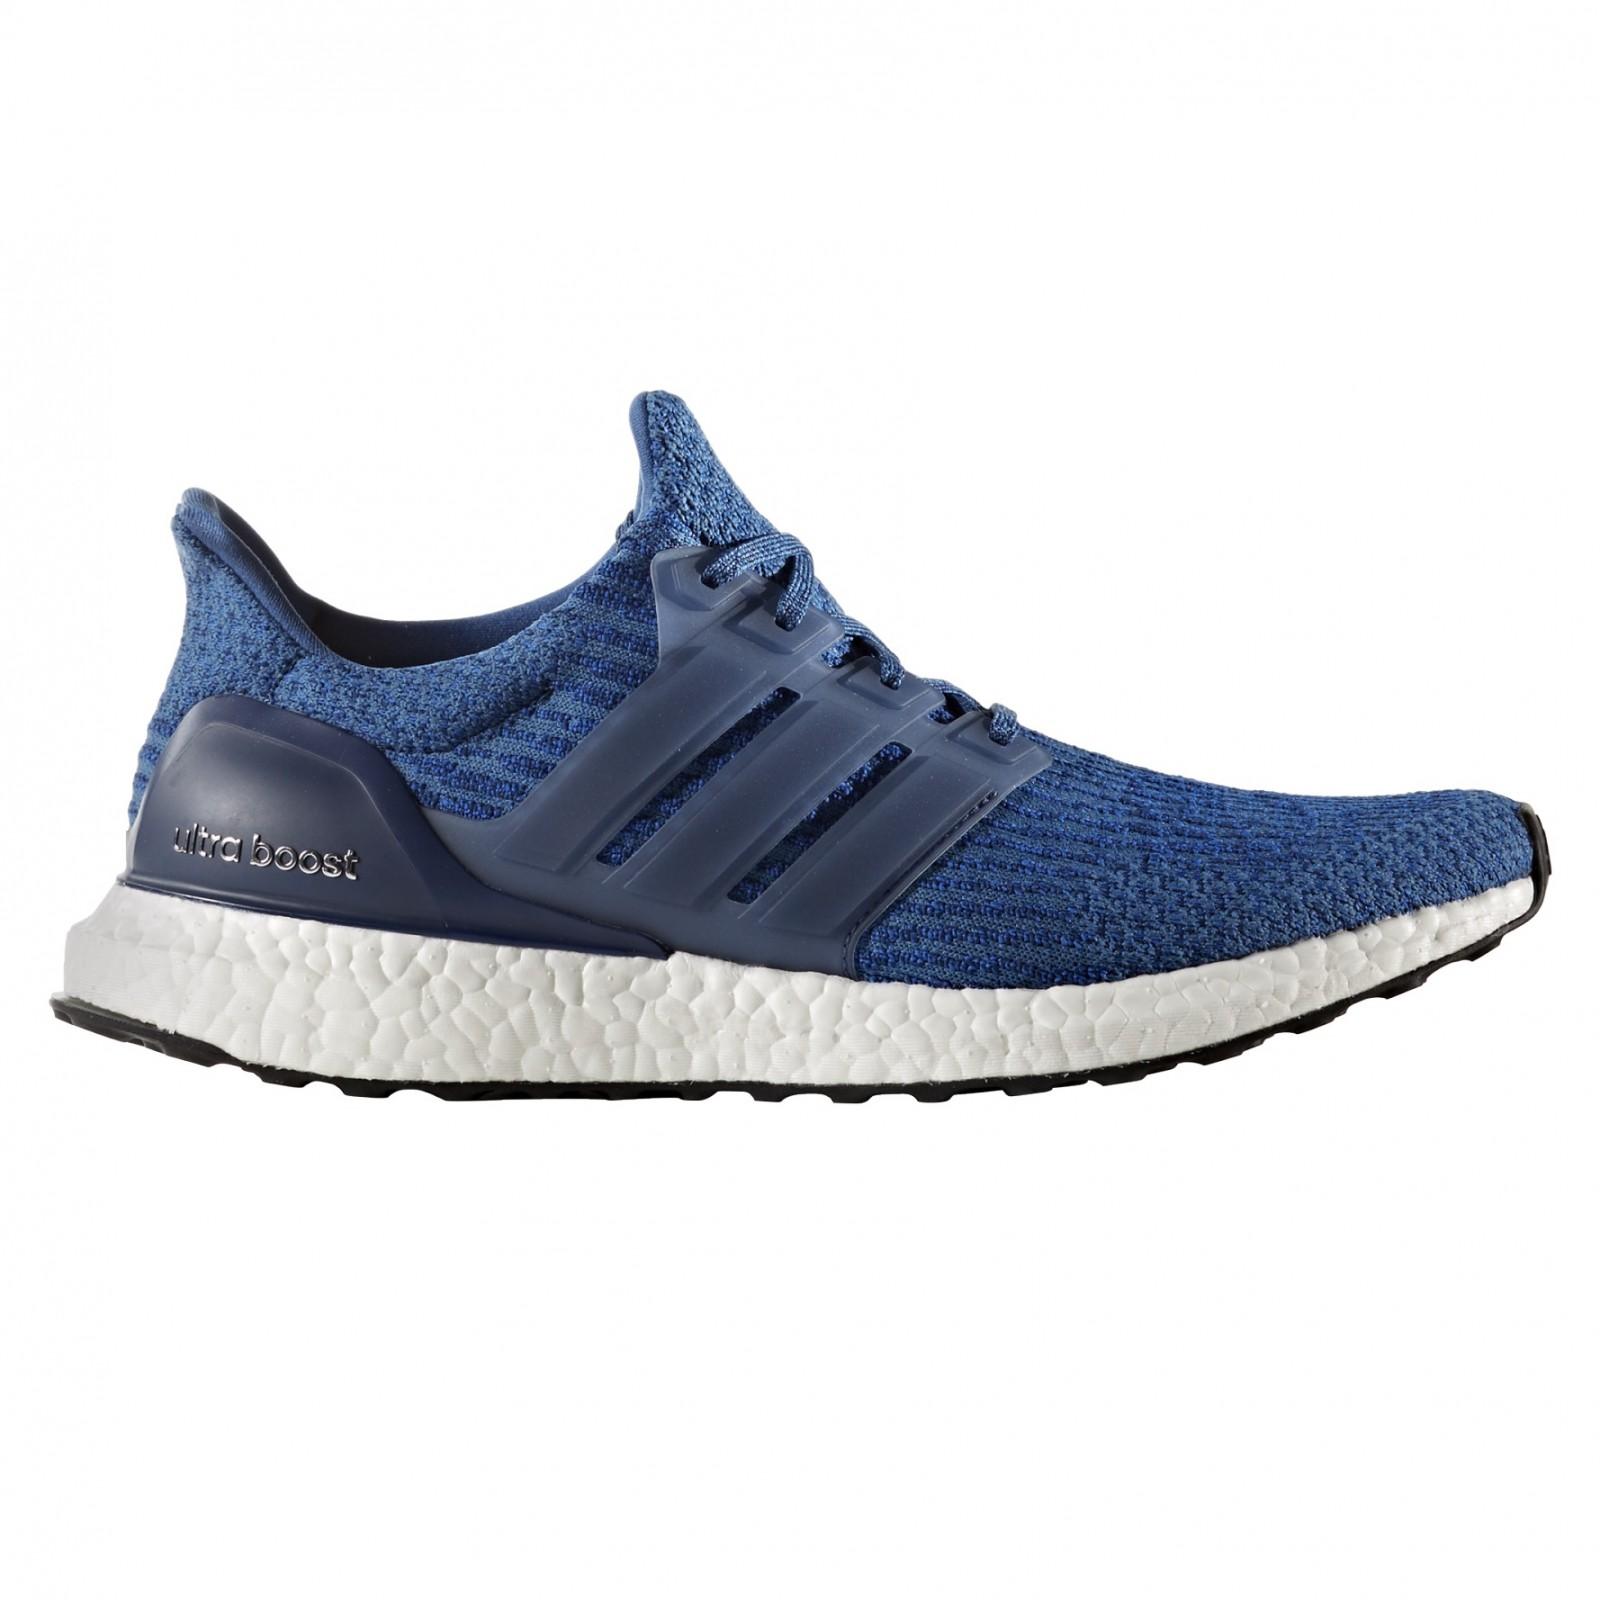 Pánské běžecké boty adidas UltraBOOST  387500f05a